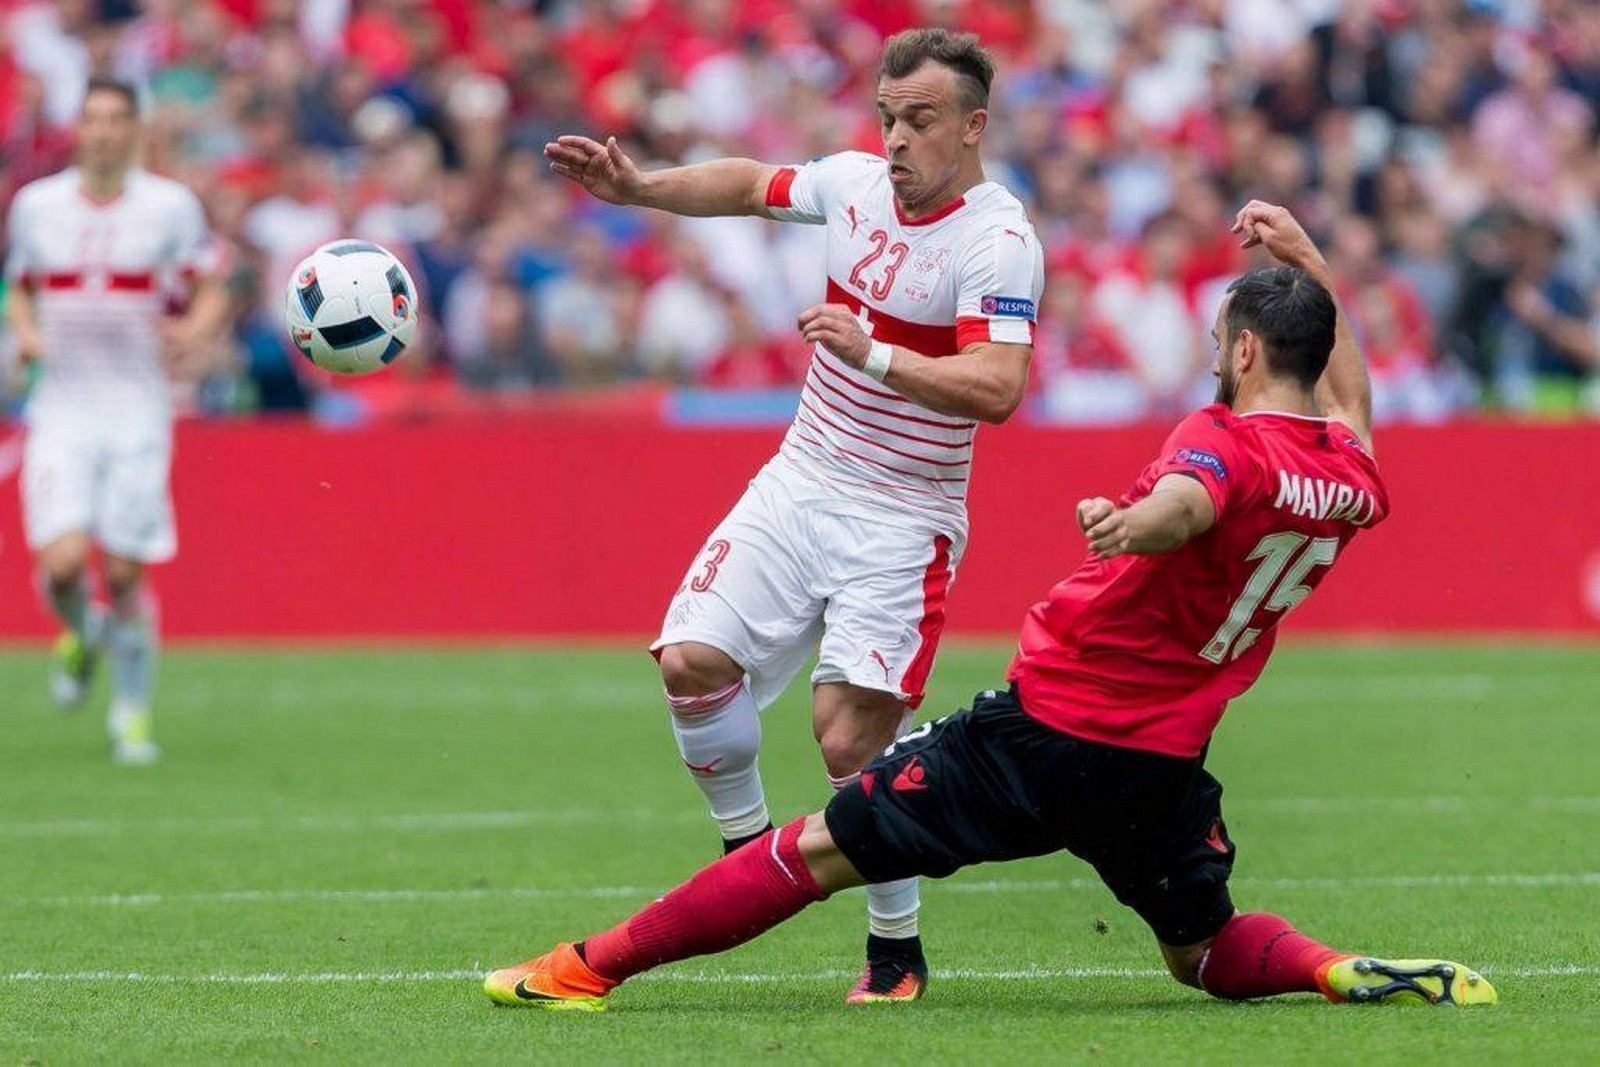 Kann Xherdan Shaqiri gegen Serbien treffen? Jetzt auf Serbien gegen Schweiz wetten!